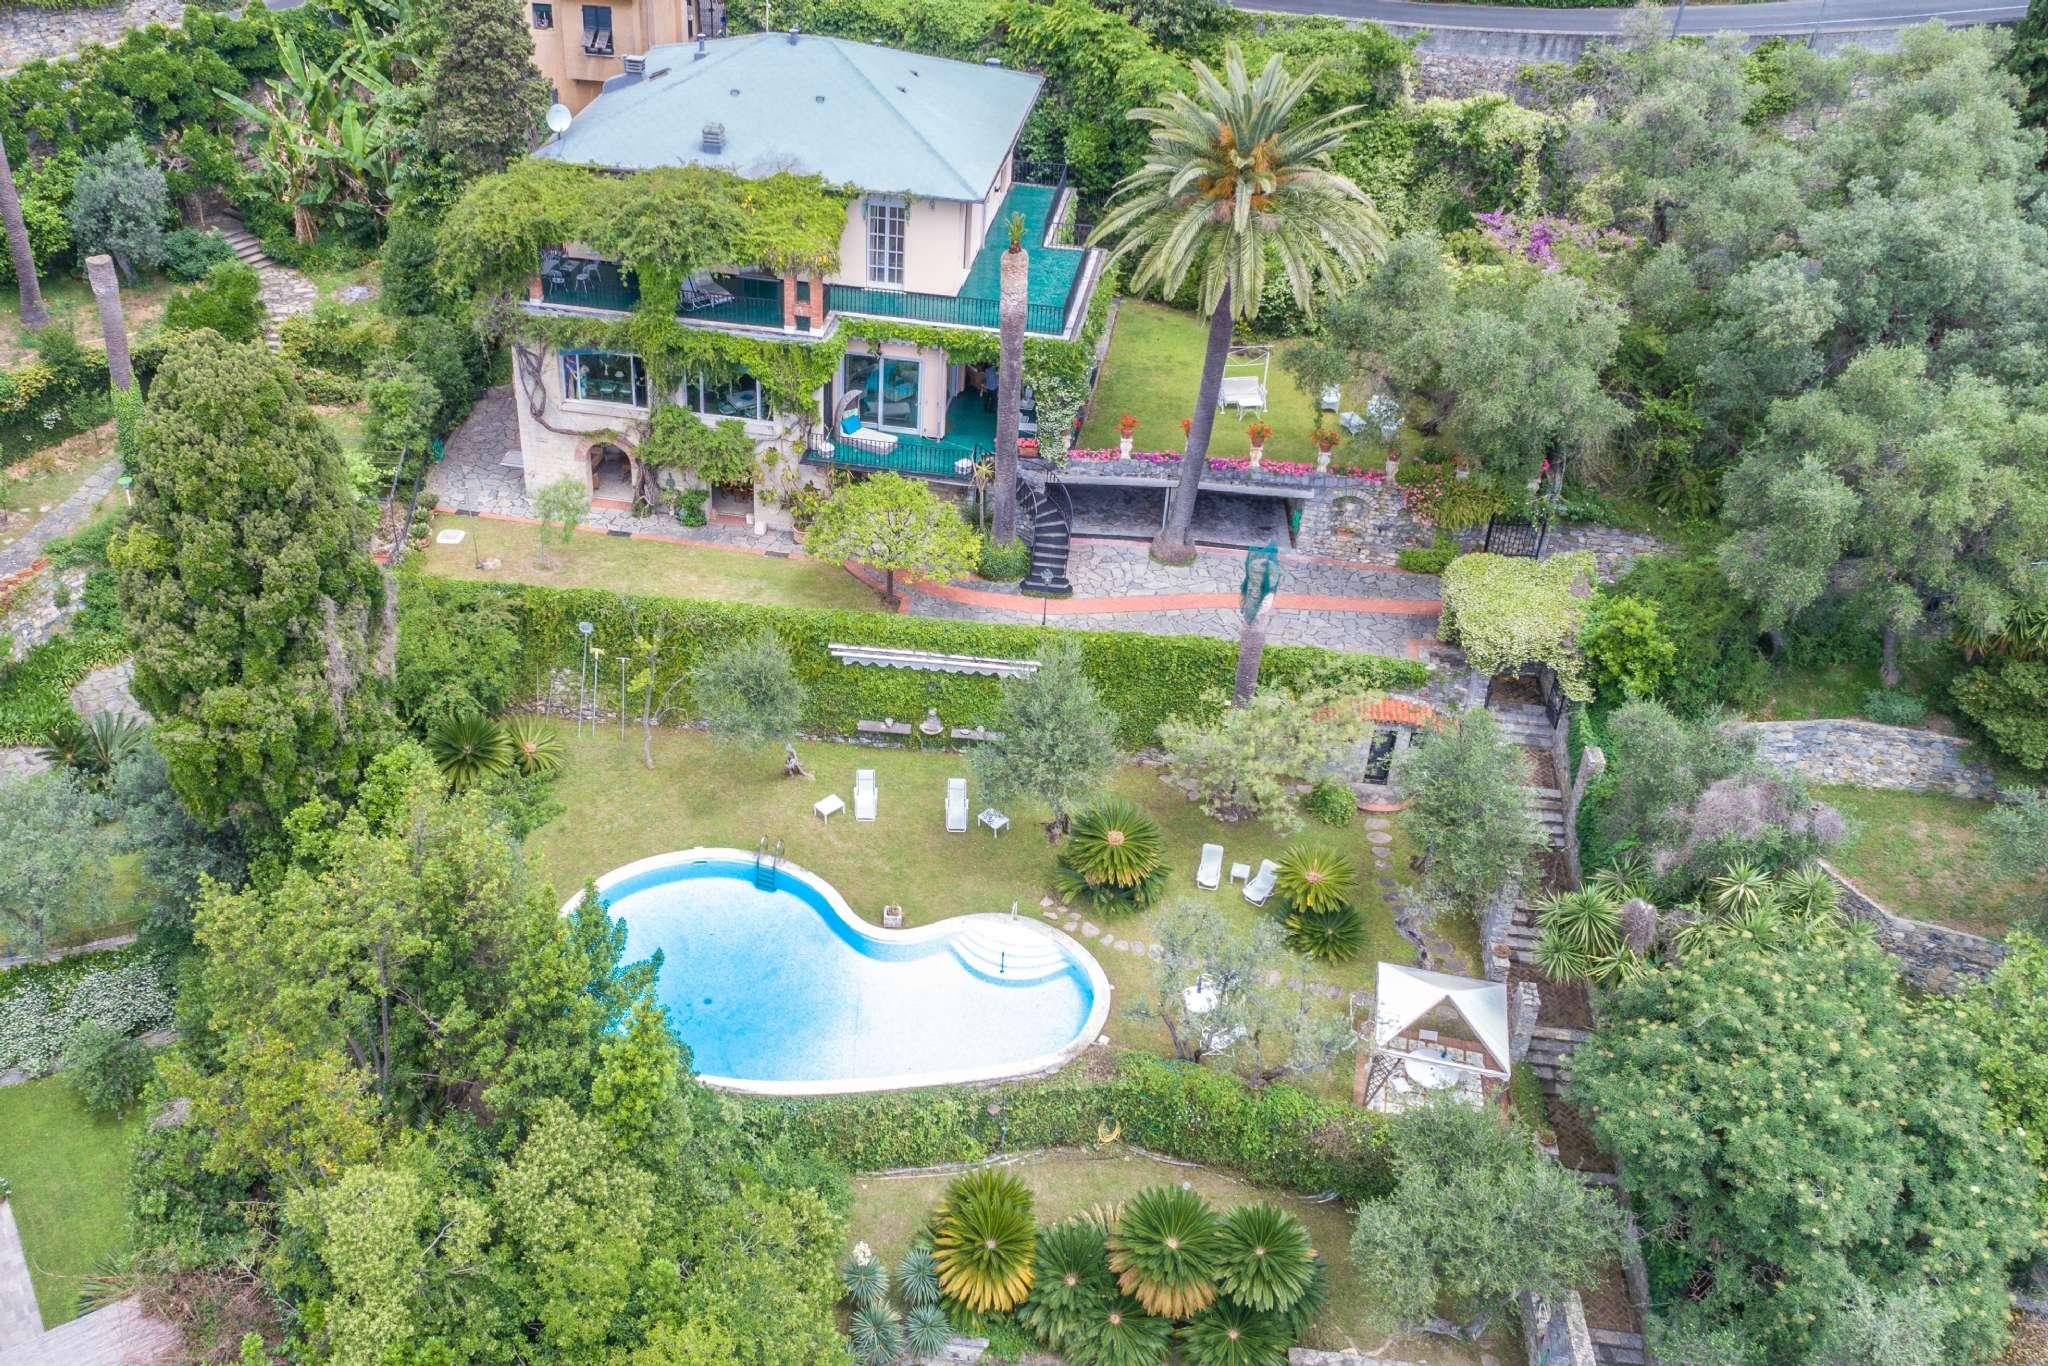 Villa in Vendita a Santa Margherita Ligure: 530 mq